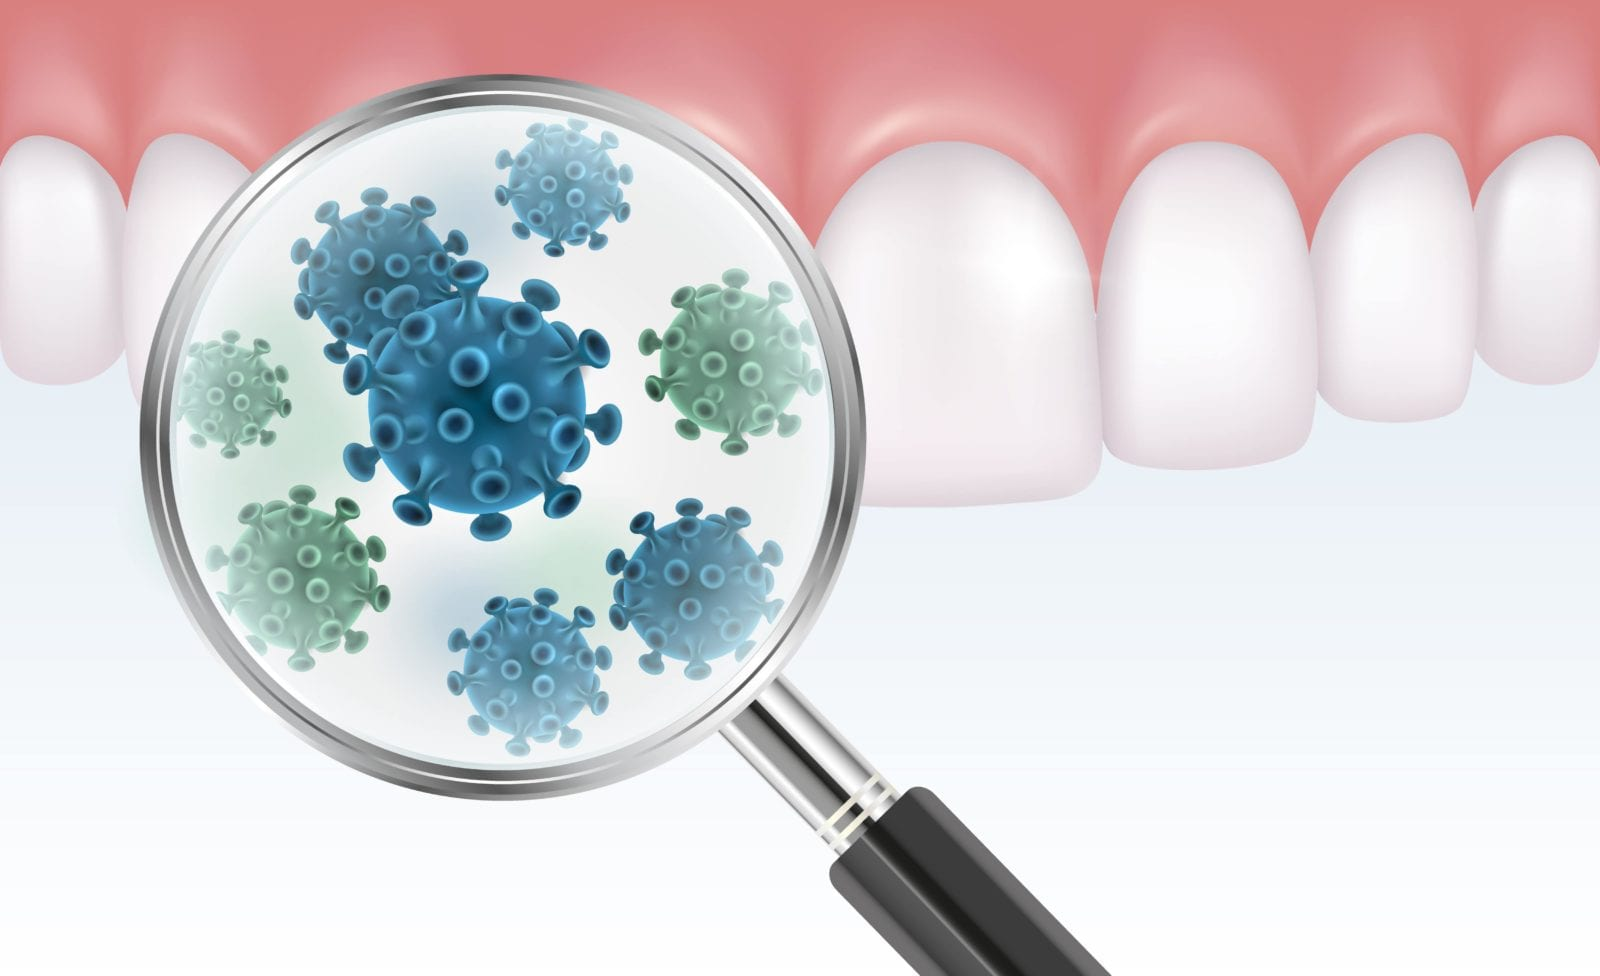 bacteria on teeth